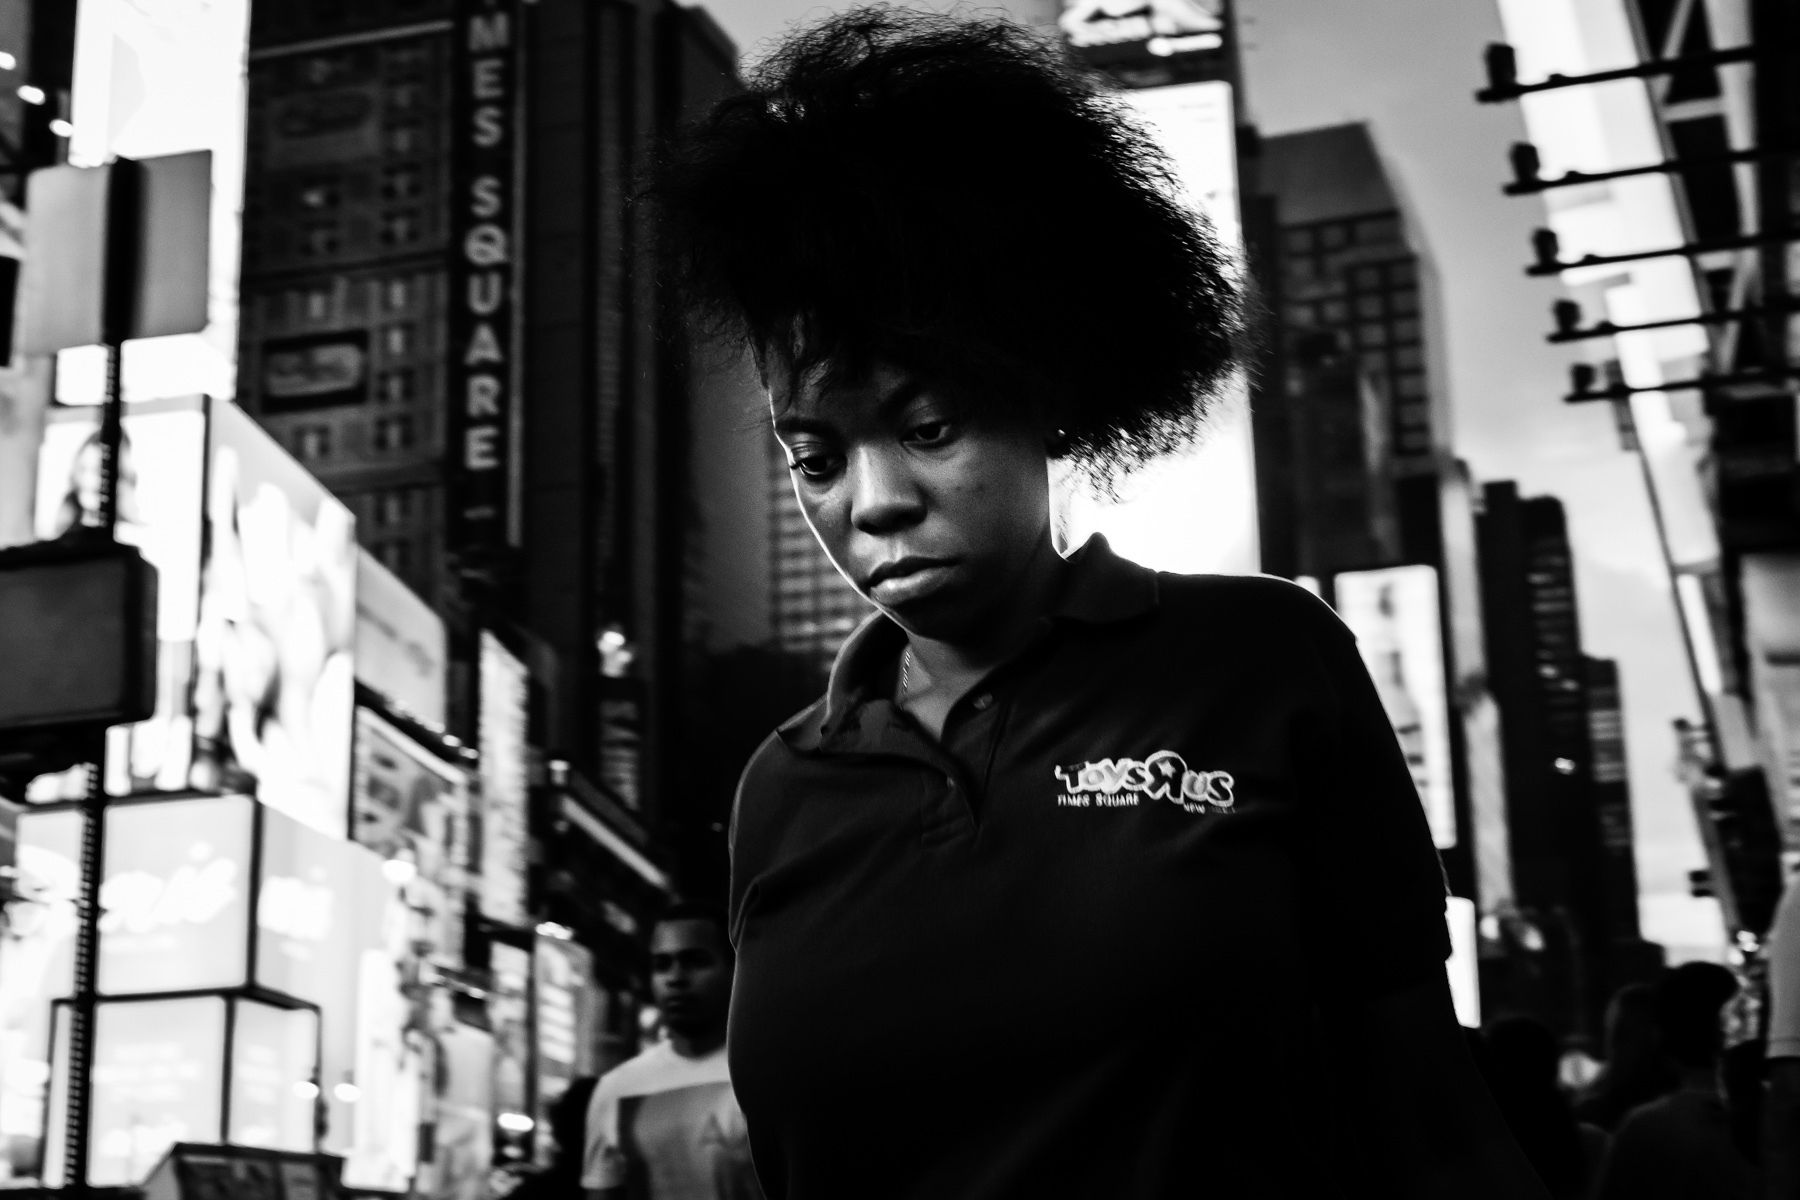 Times Square, New York, NY, 2013